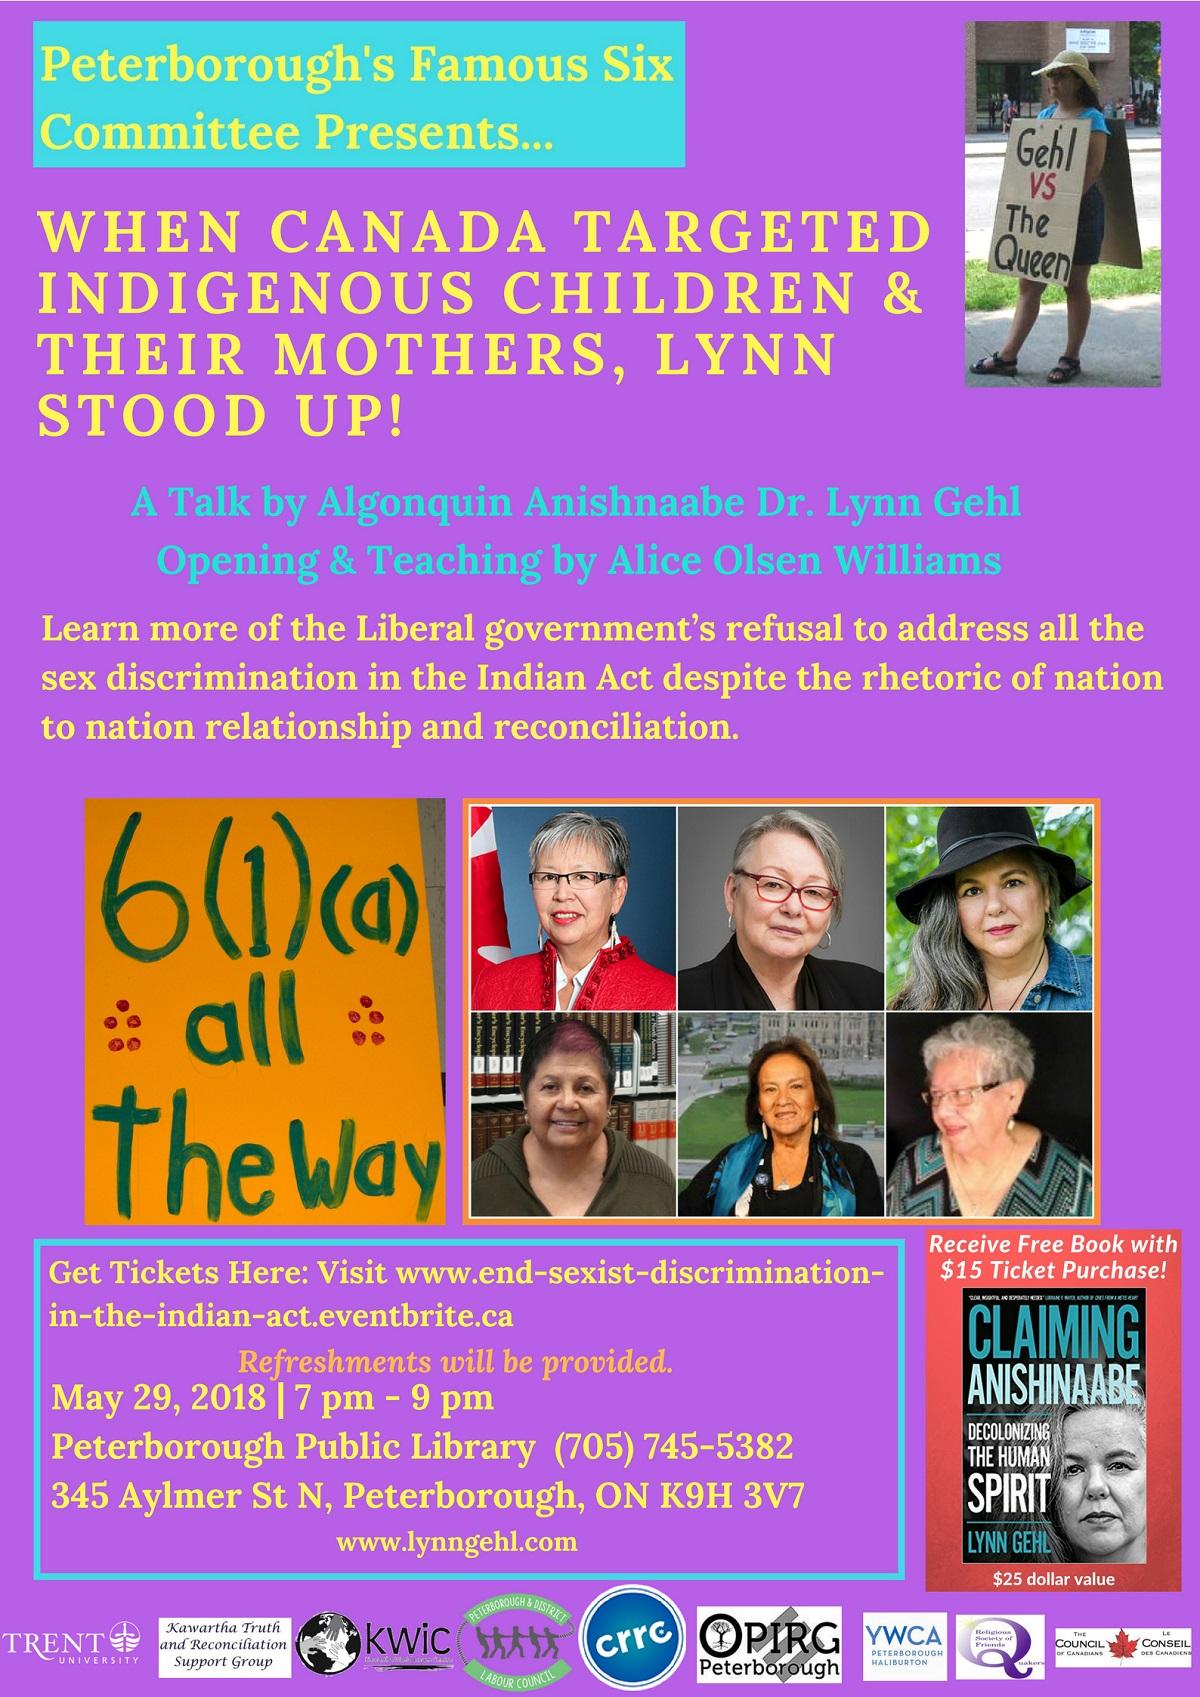 Honouring Algonquin Anishinaabe Dr. Lynn Gehl Event Poster